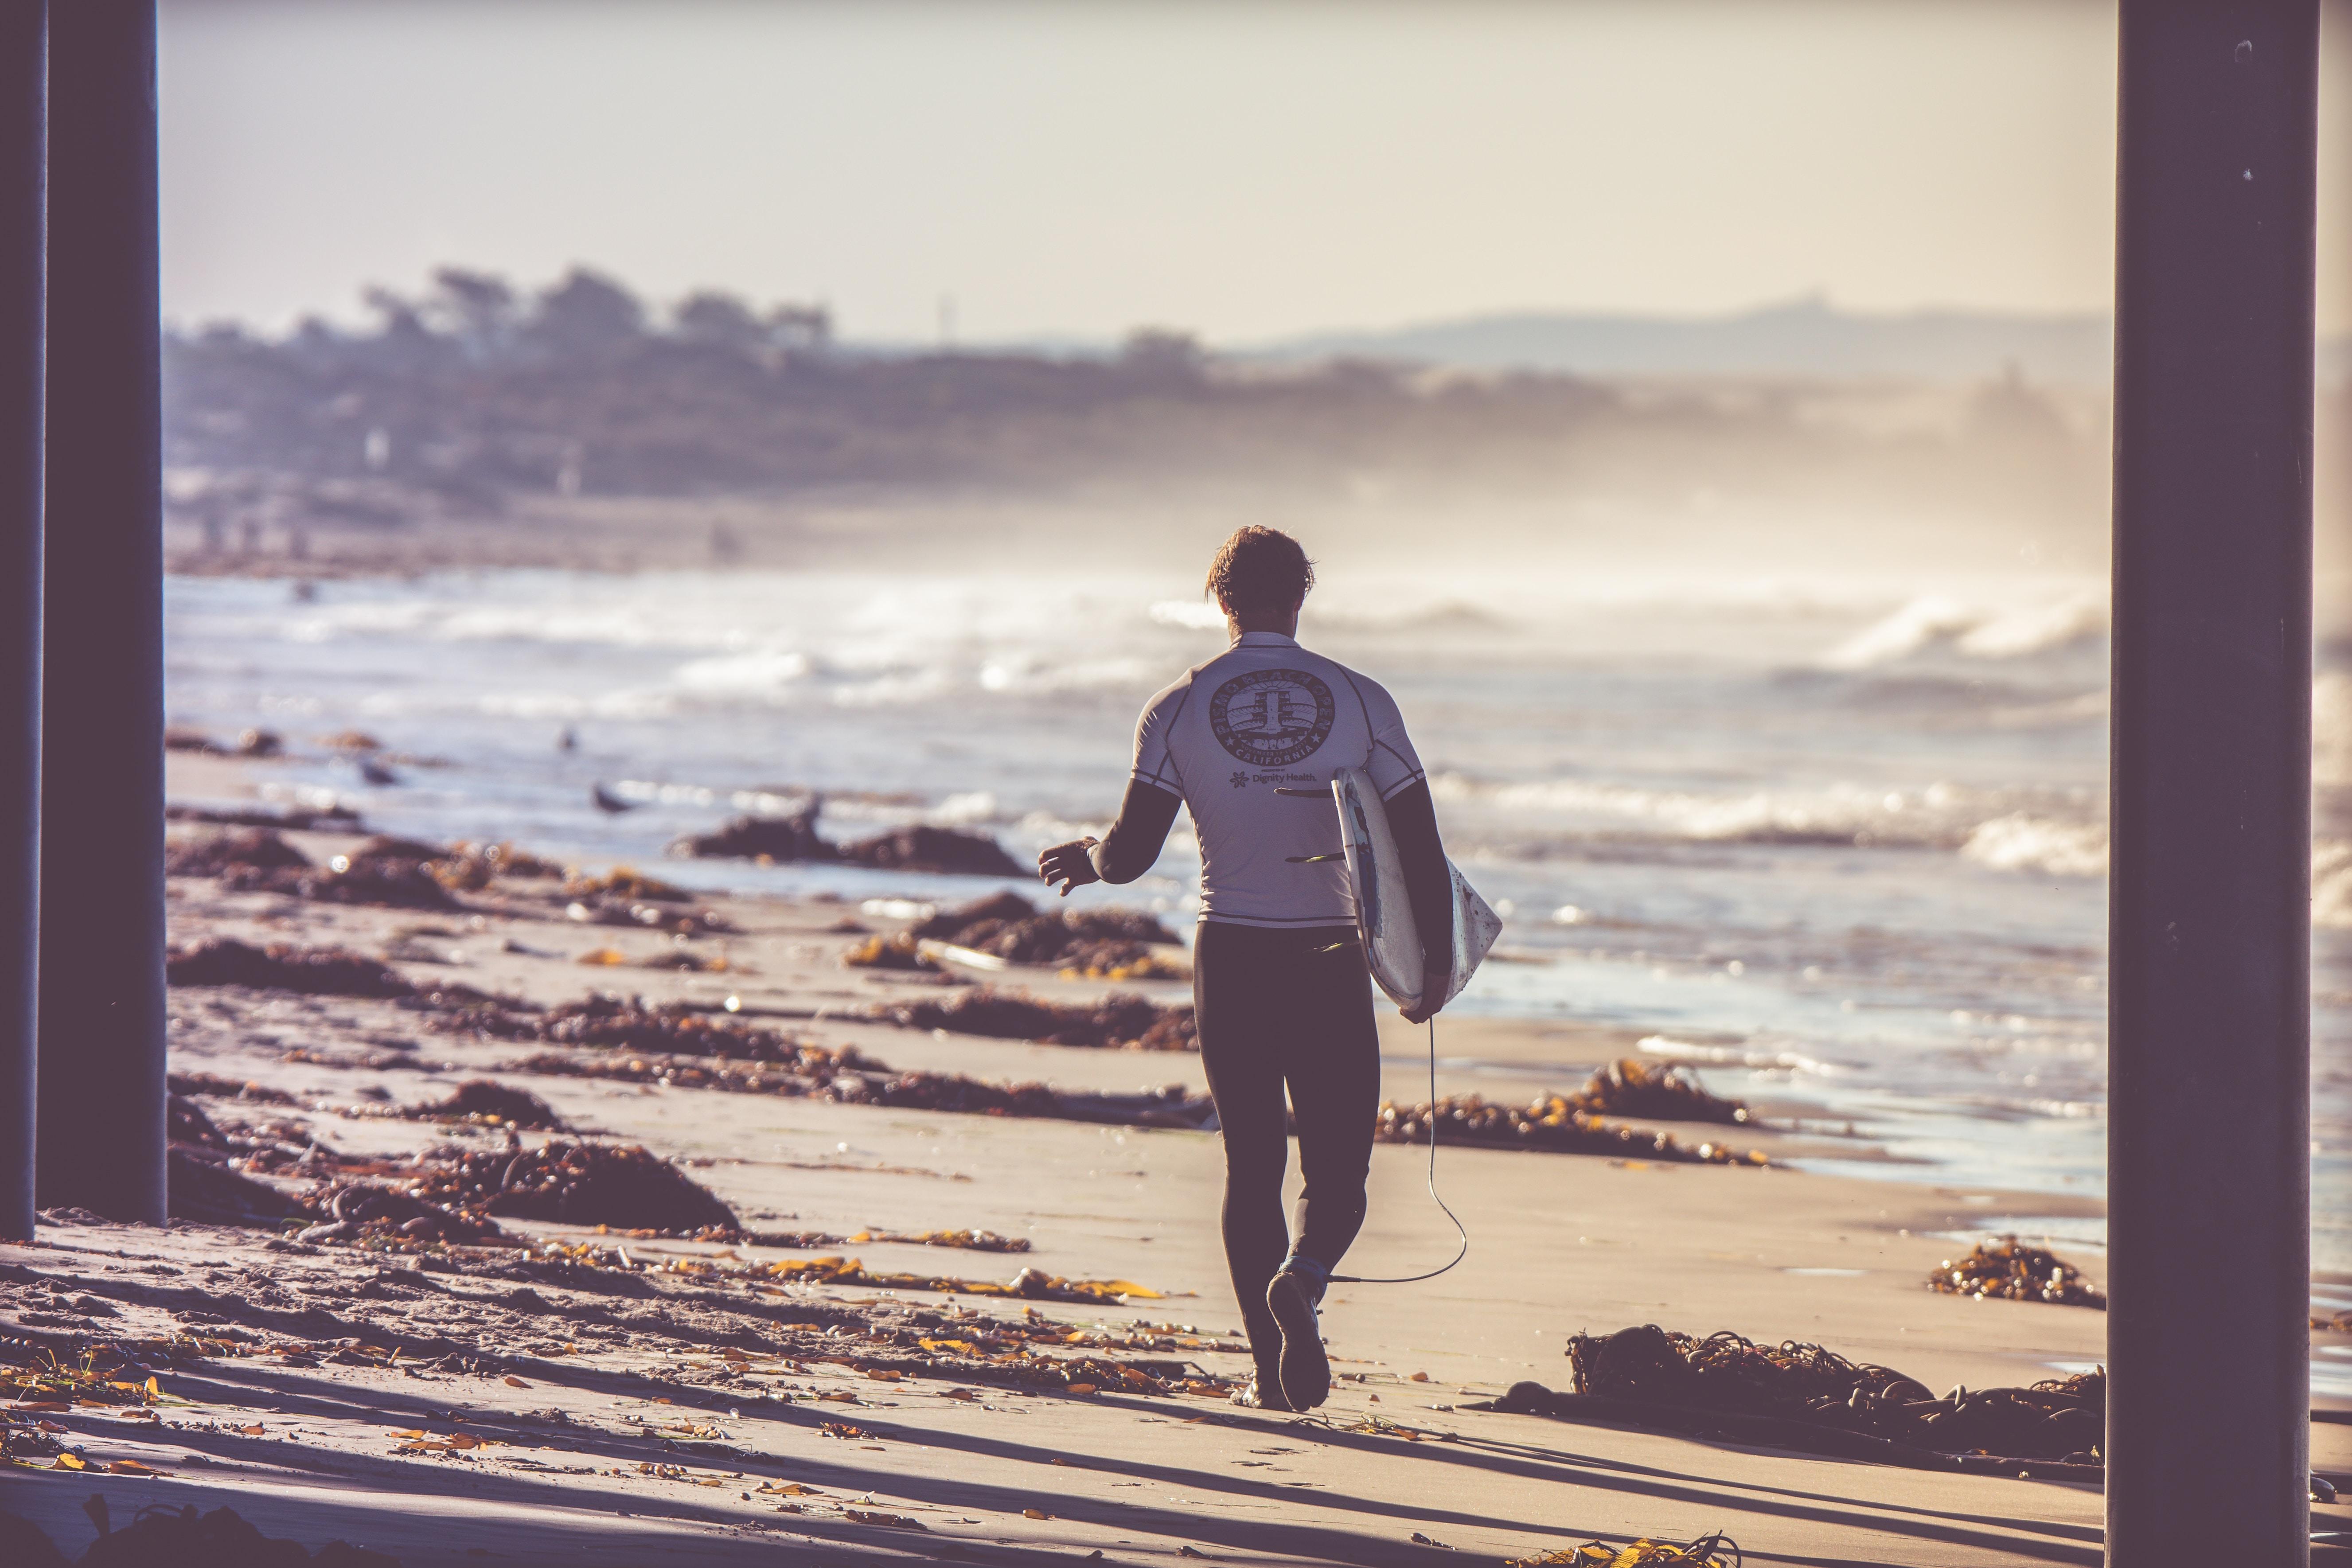 man carrying white surfboard walking towards beach